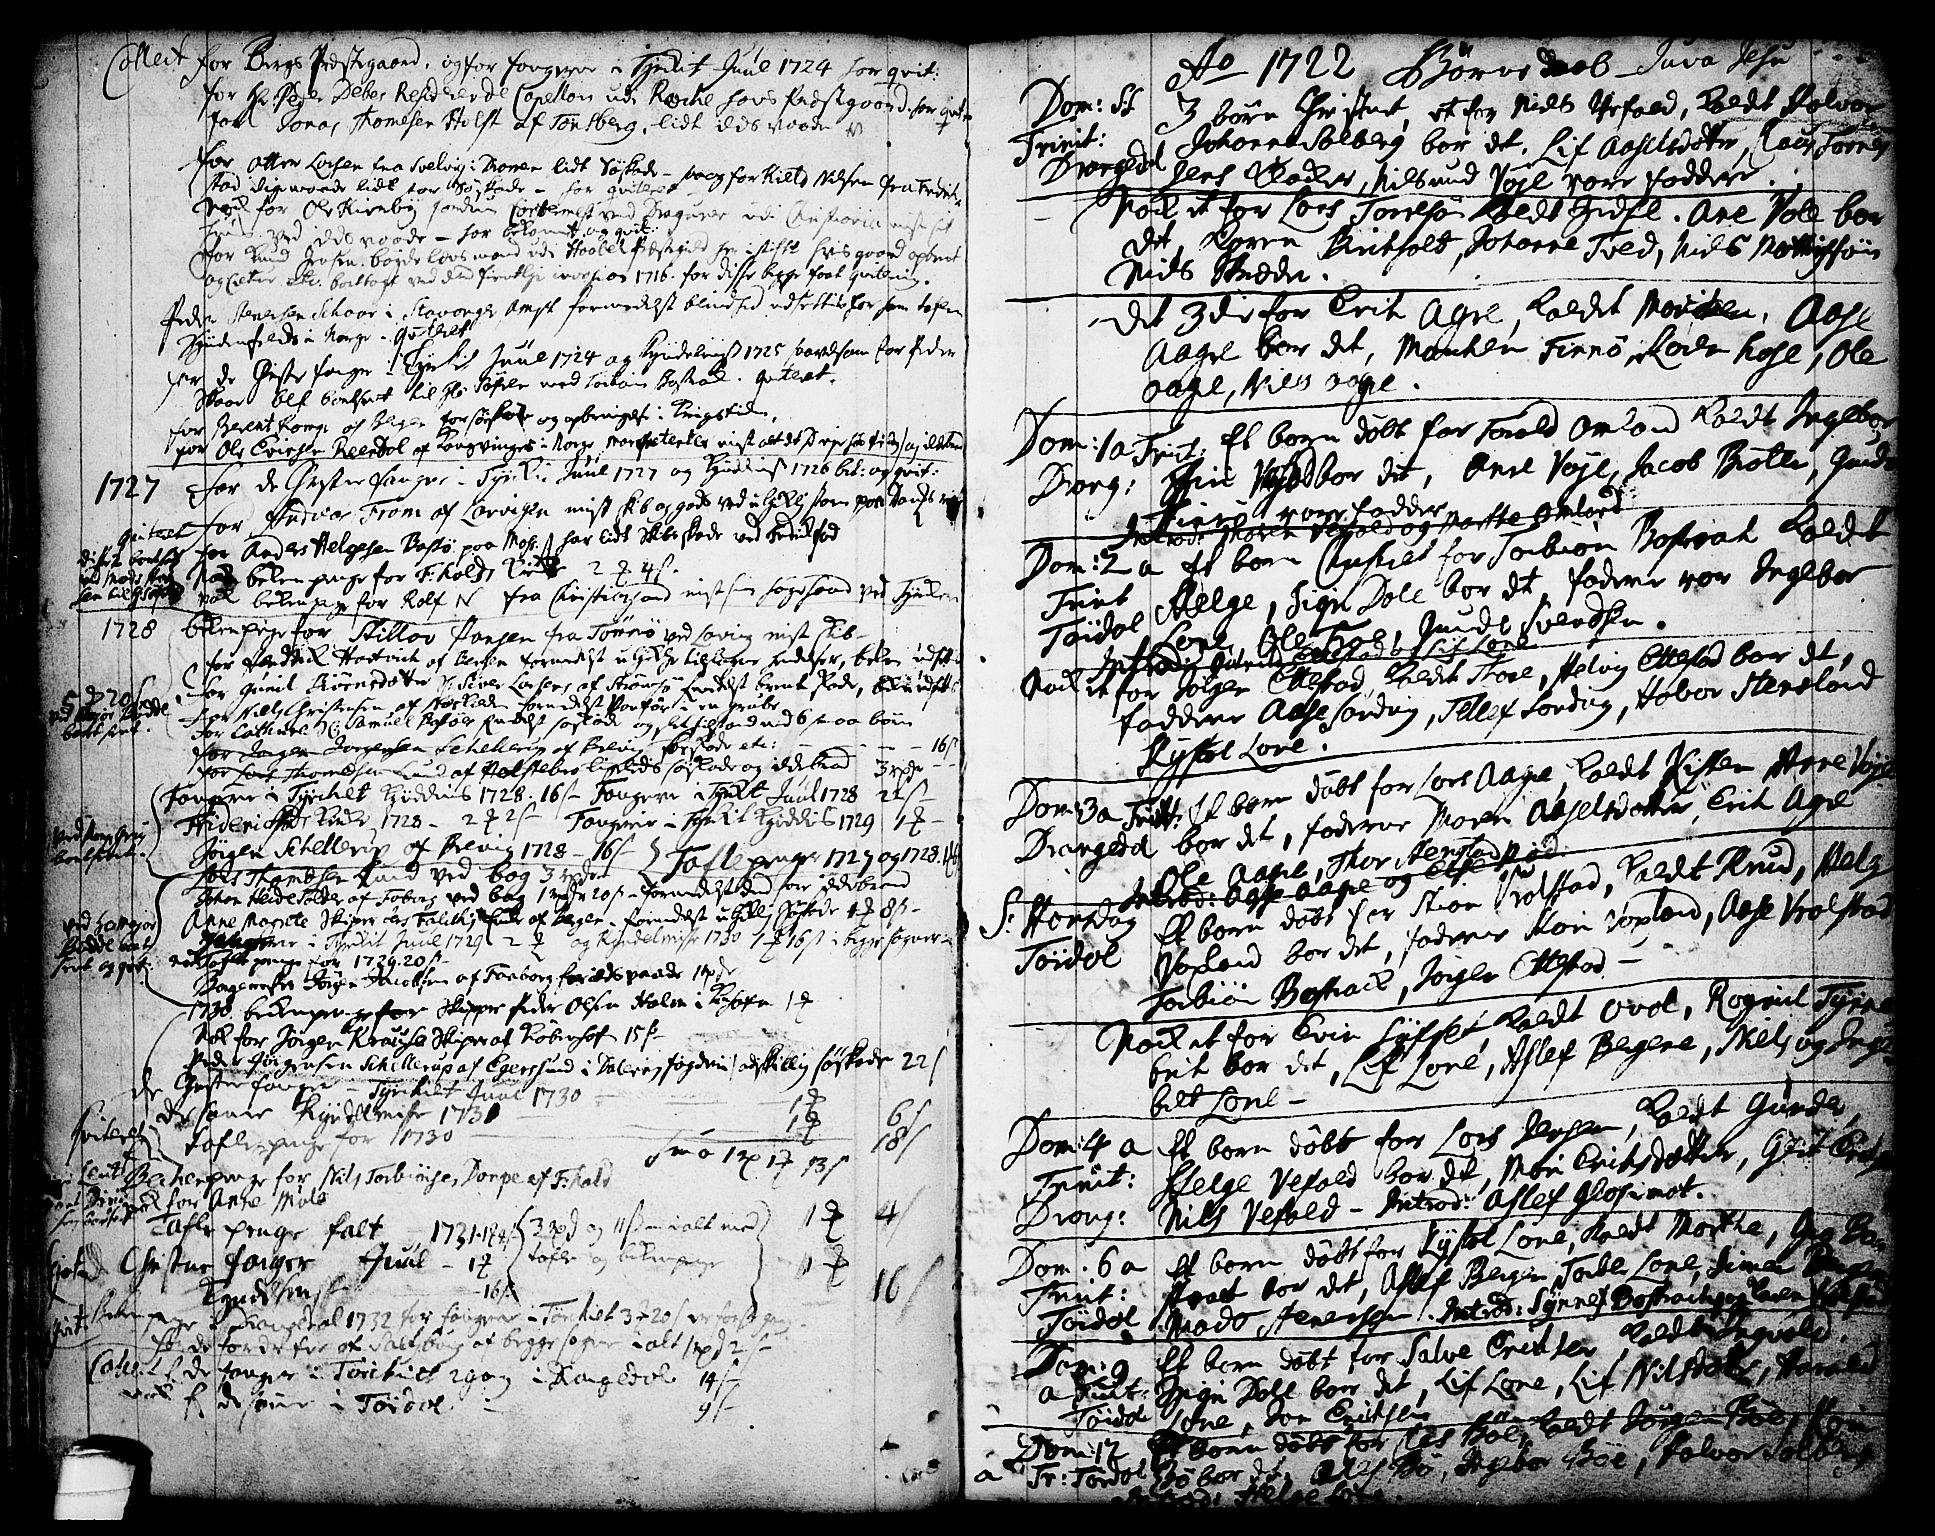 SAKO, Drangedal kirkebøker, F/Fa/L0001: Ministerialbok nr. 1, 1697-1767, s. 43